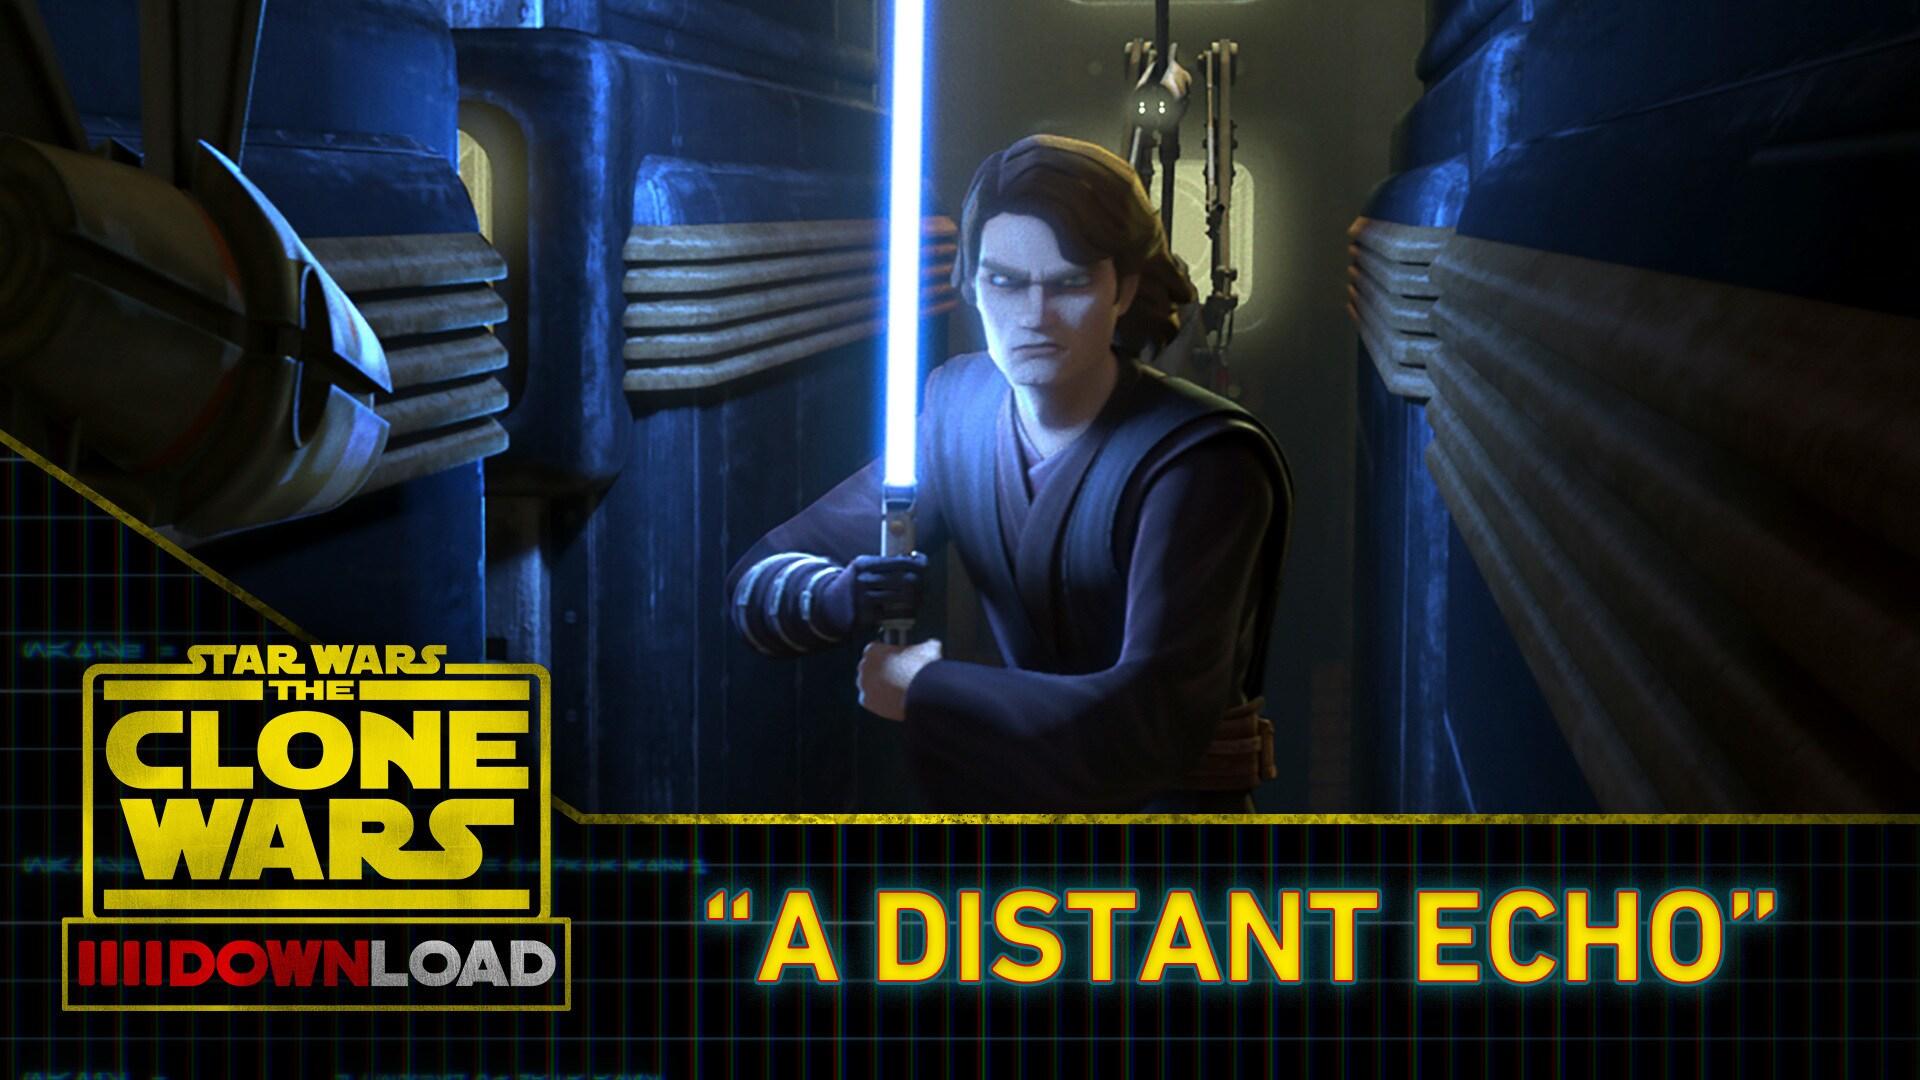 Clone Wars Download: A Distant Echo